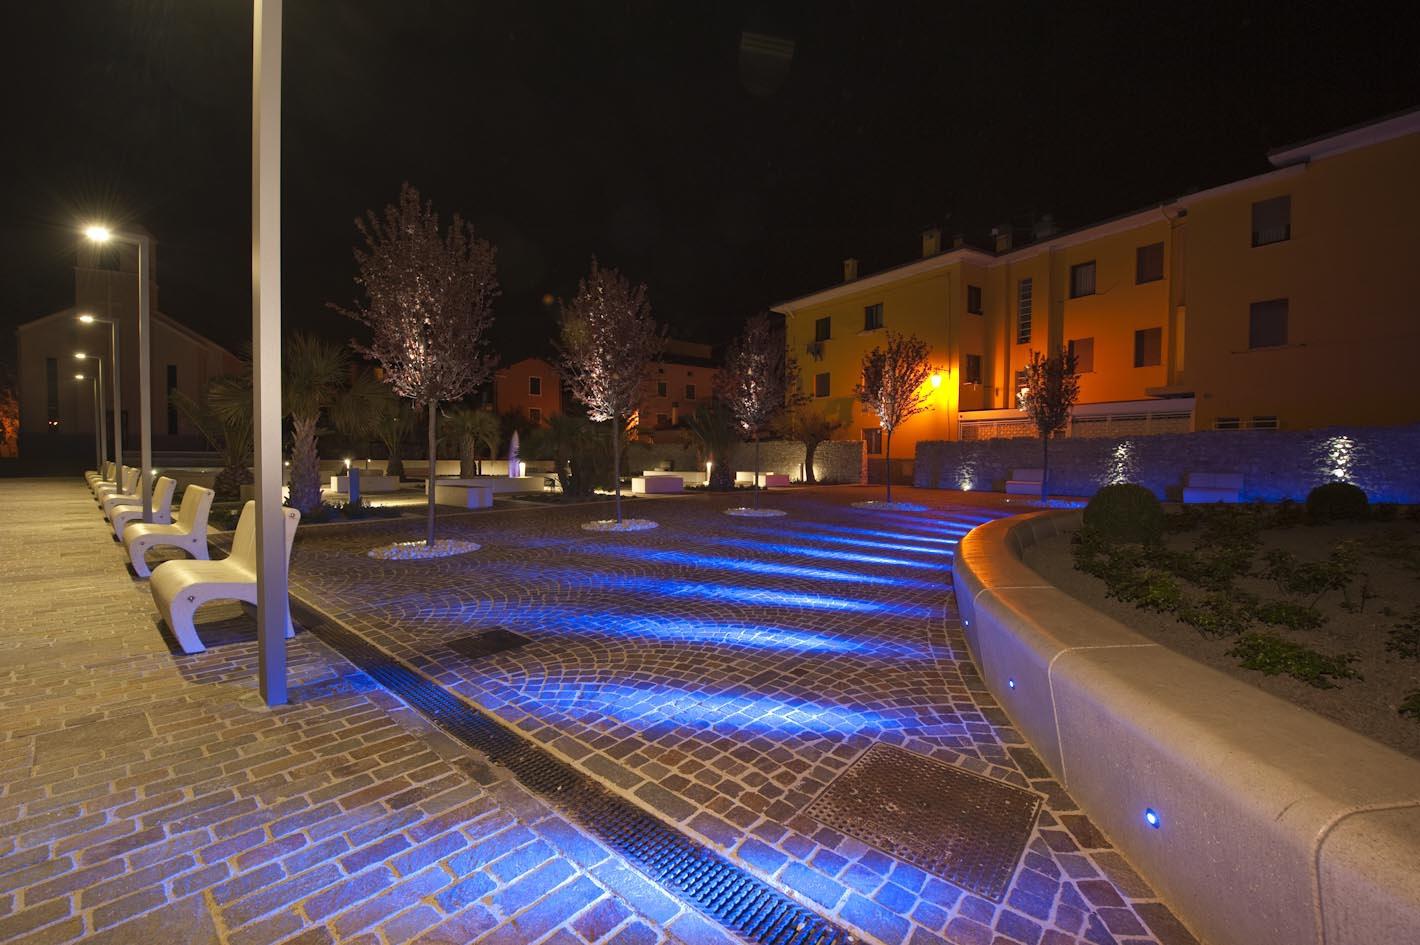 Arredo urbano torbole sul garda giovanella for Arredo urbano srl bolzano